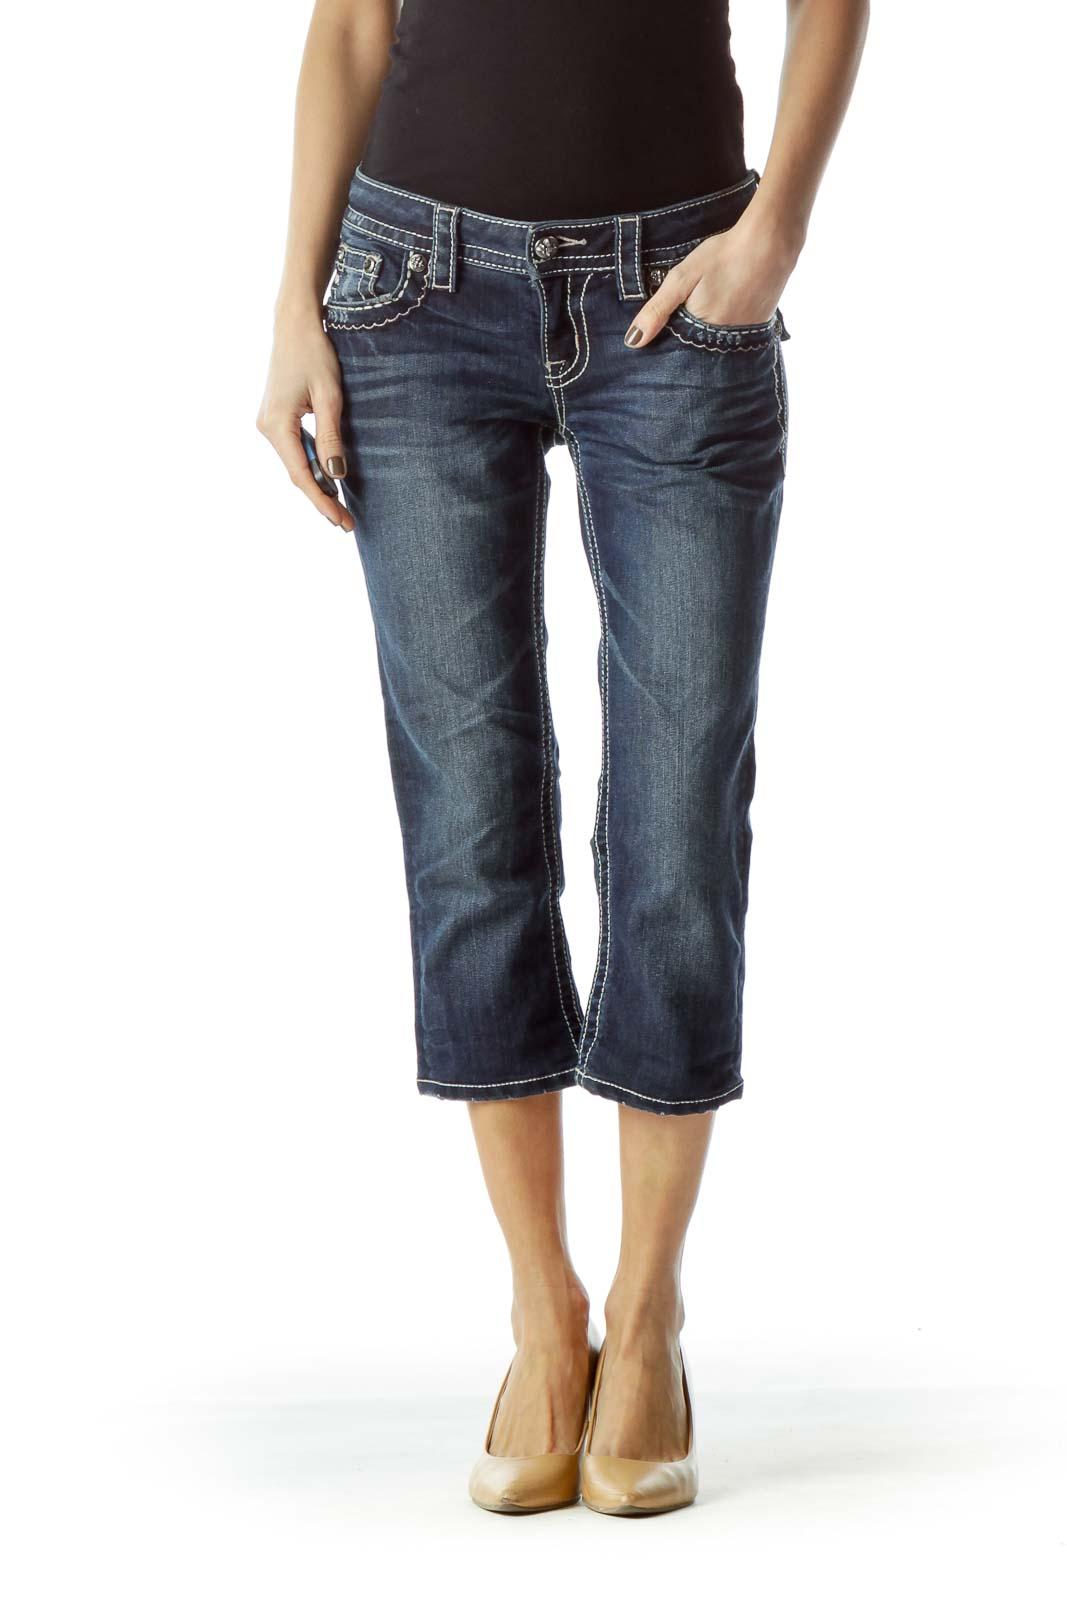 Blue Dark Wash Stitched Capri Denim Jeans